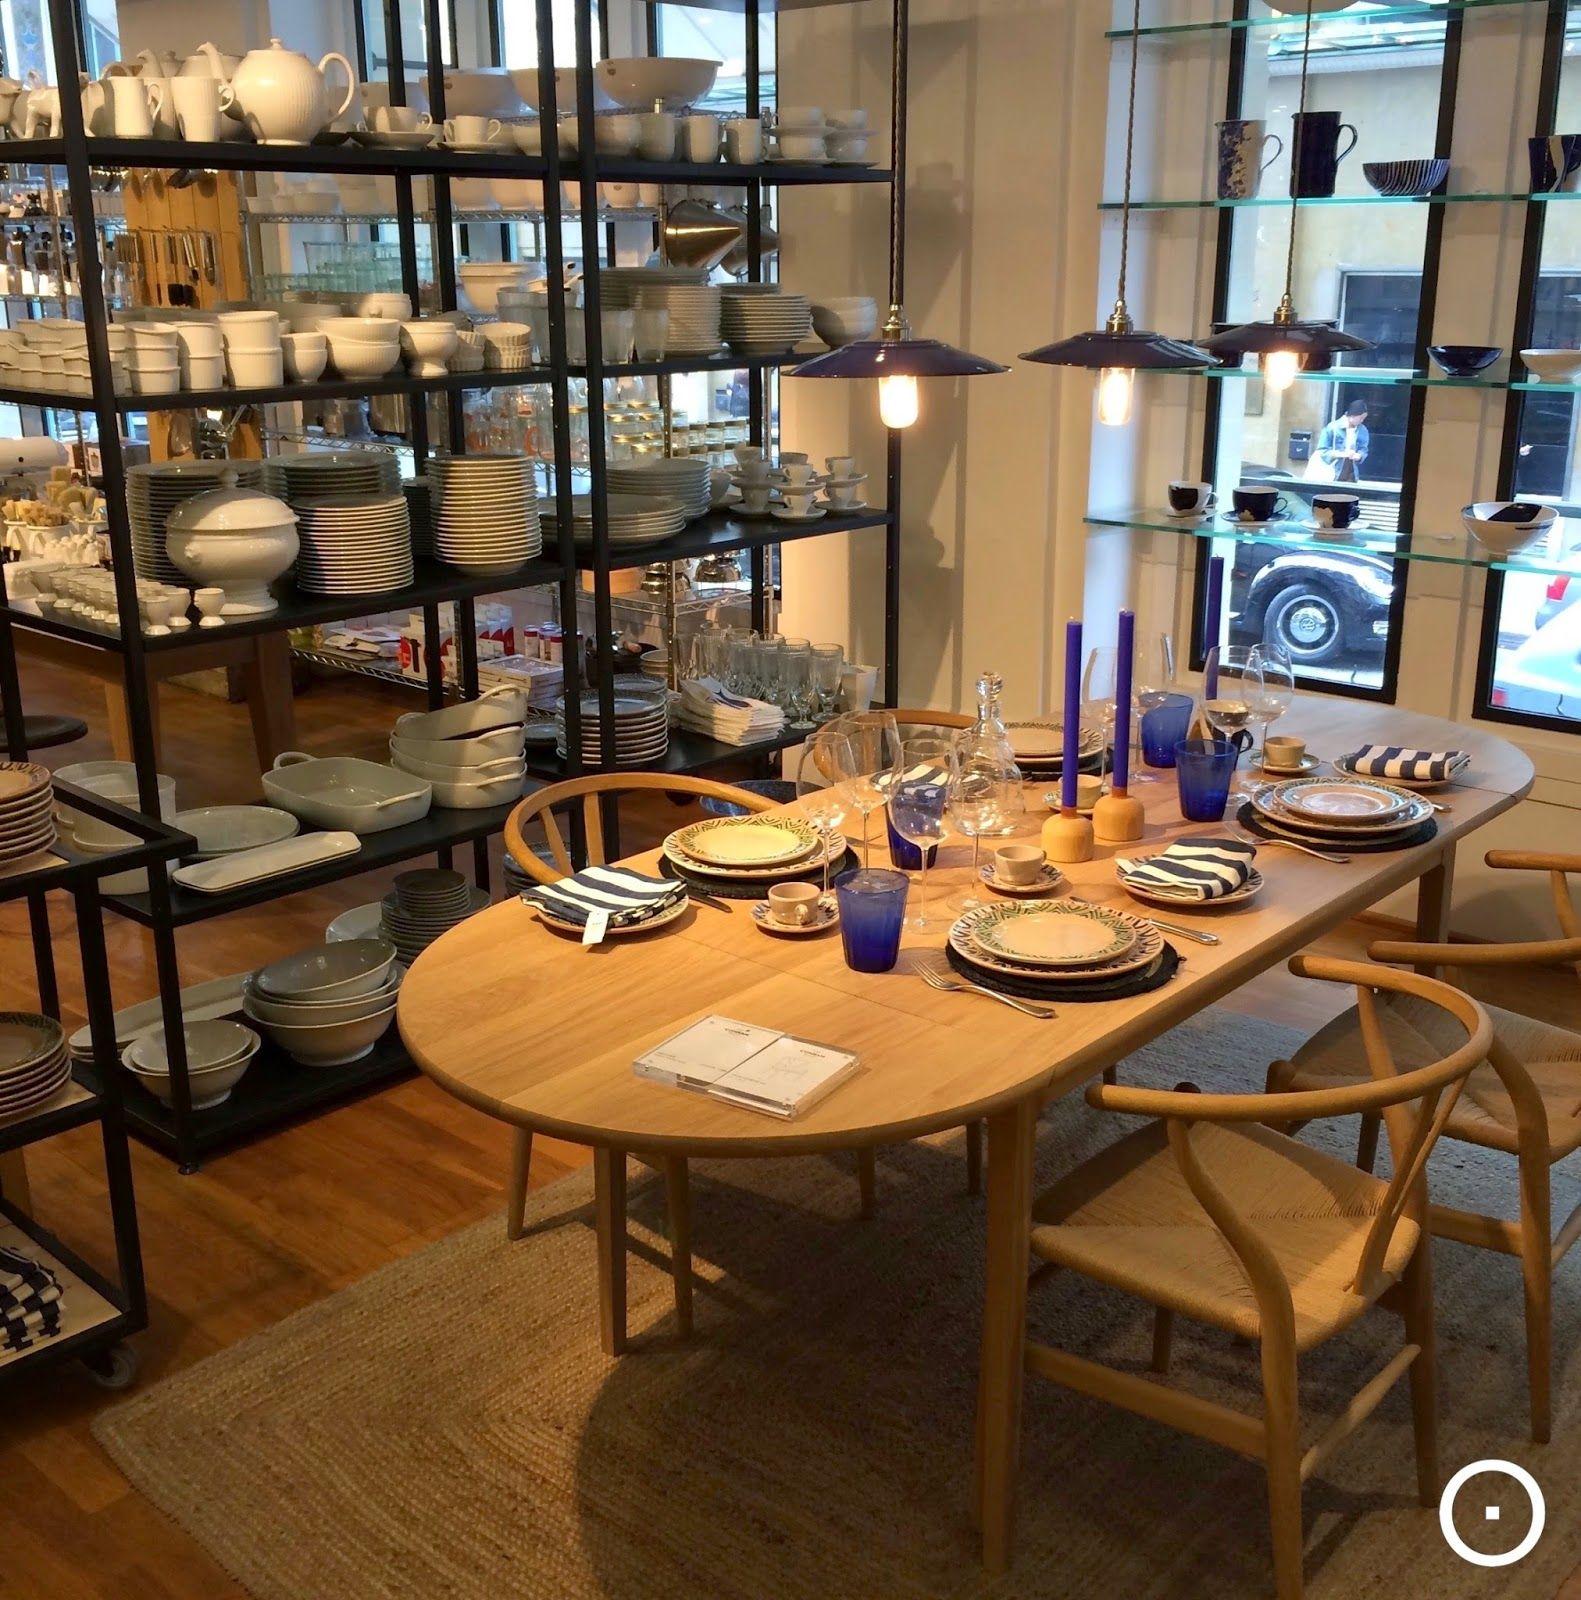 viewonretail in paris the conran shop the conran shop. Black Bedroom Furniture Sets. Home Design Ideas